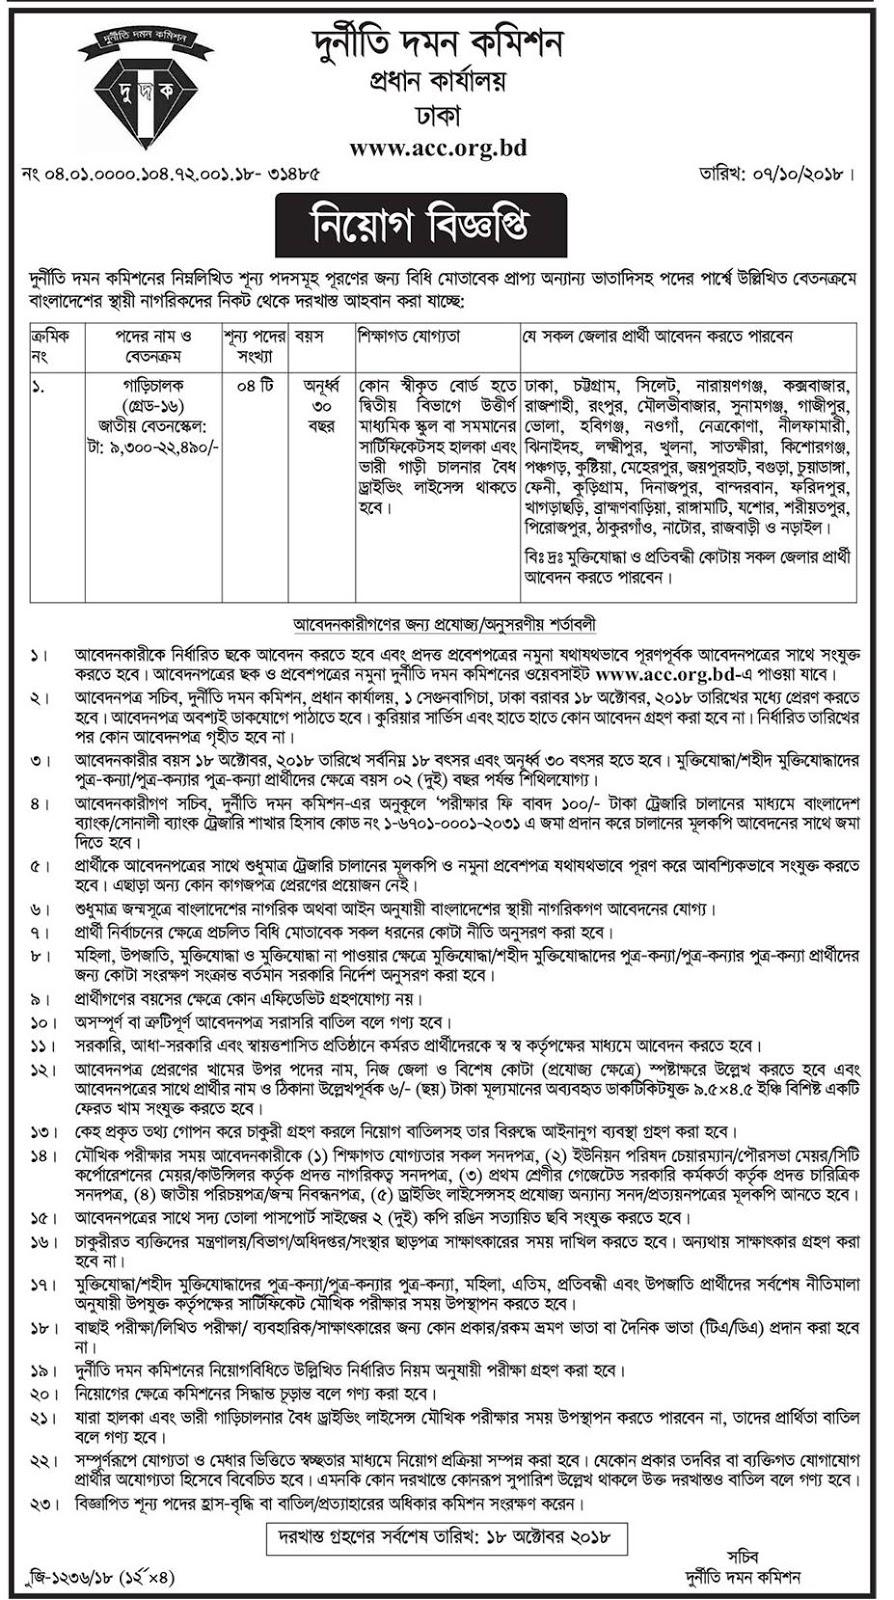 Anti-Corruption Commission (ACC) Driver Job Circular 2018